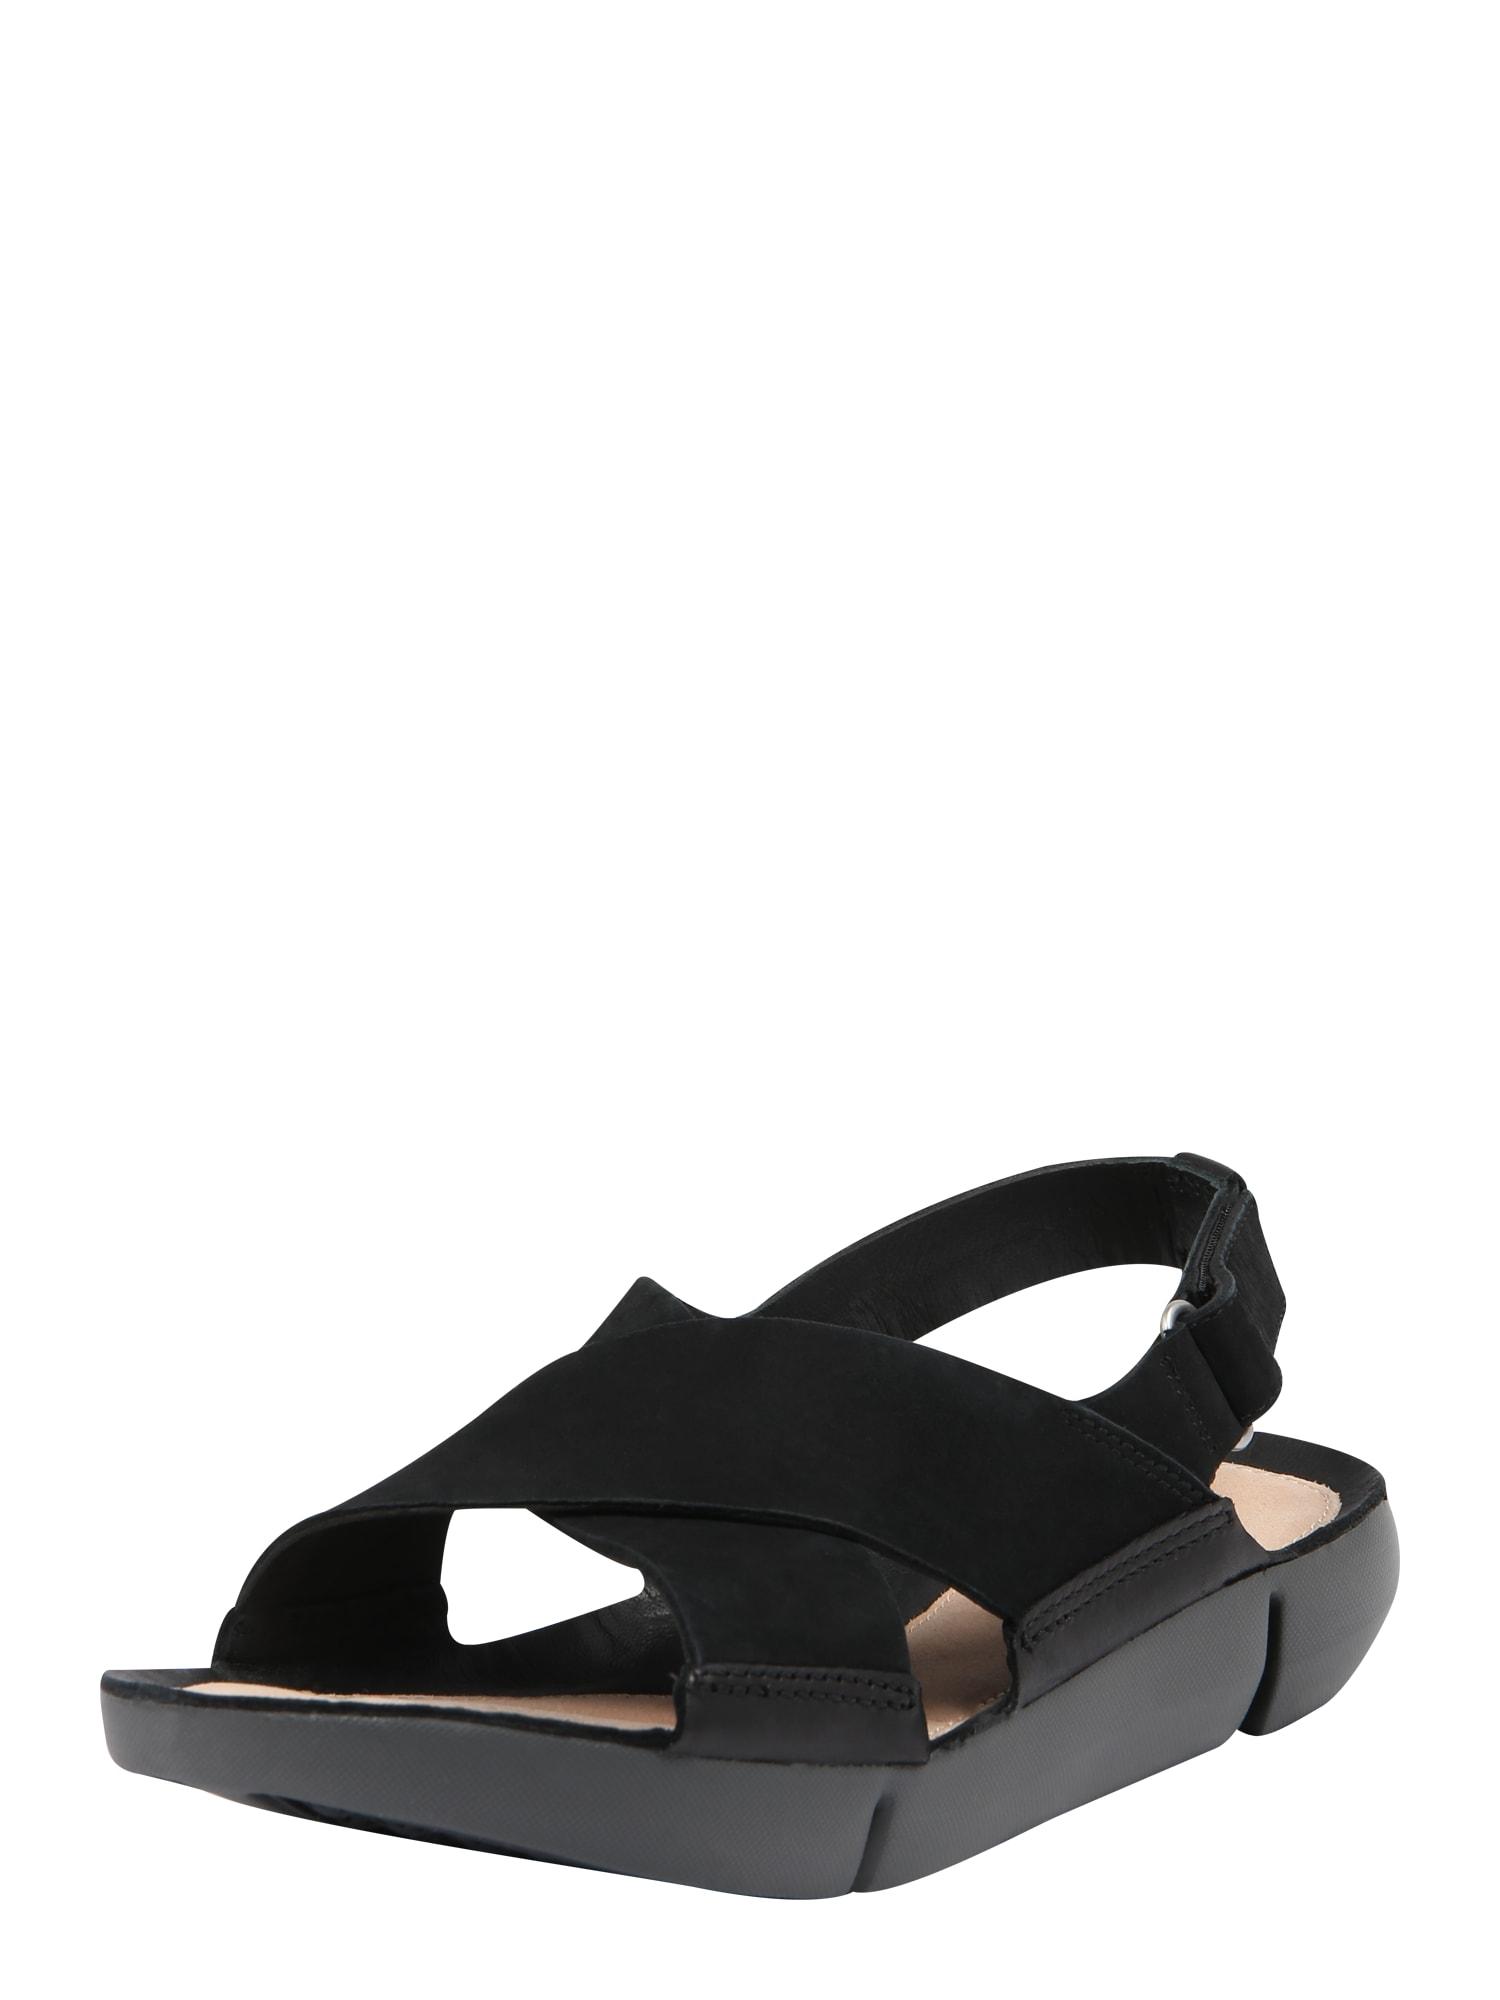 Sandály Tri Chloe černá CLARKS